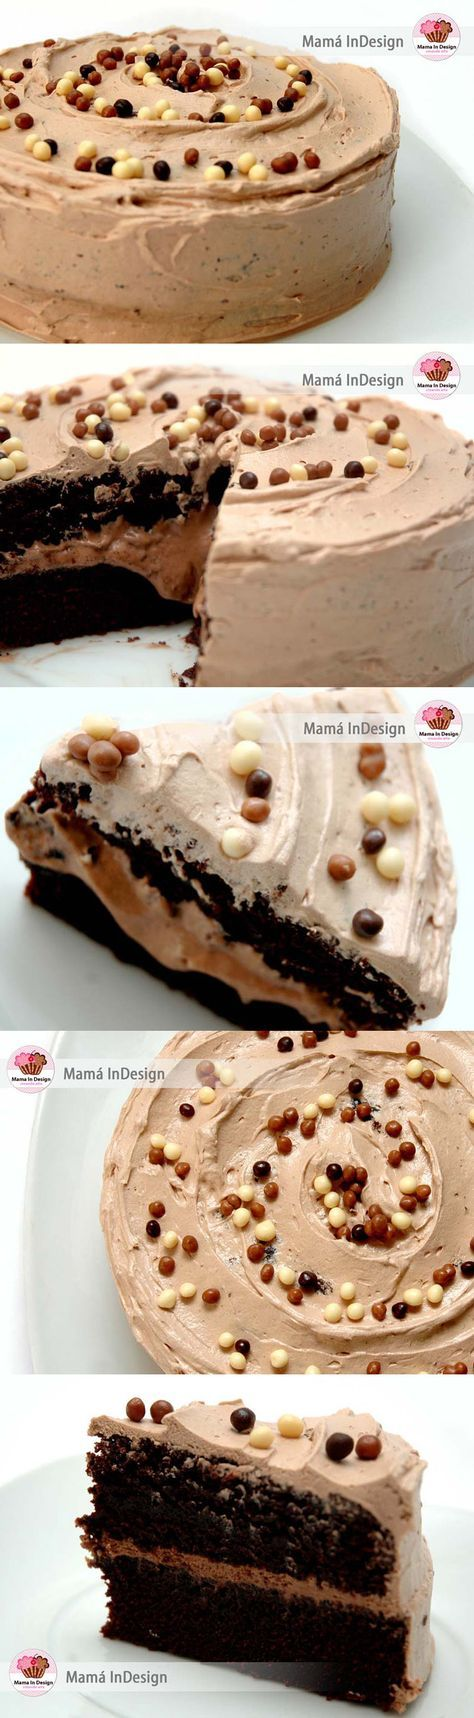 tarta-chocolate-frosting-nutella-2-pecados-reposteria